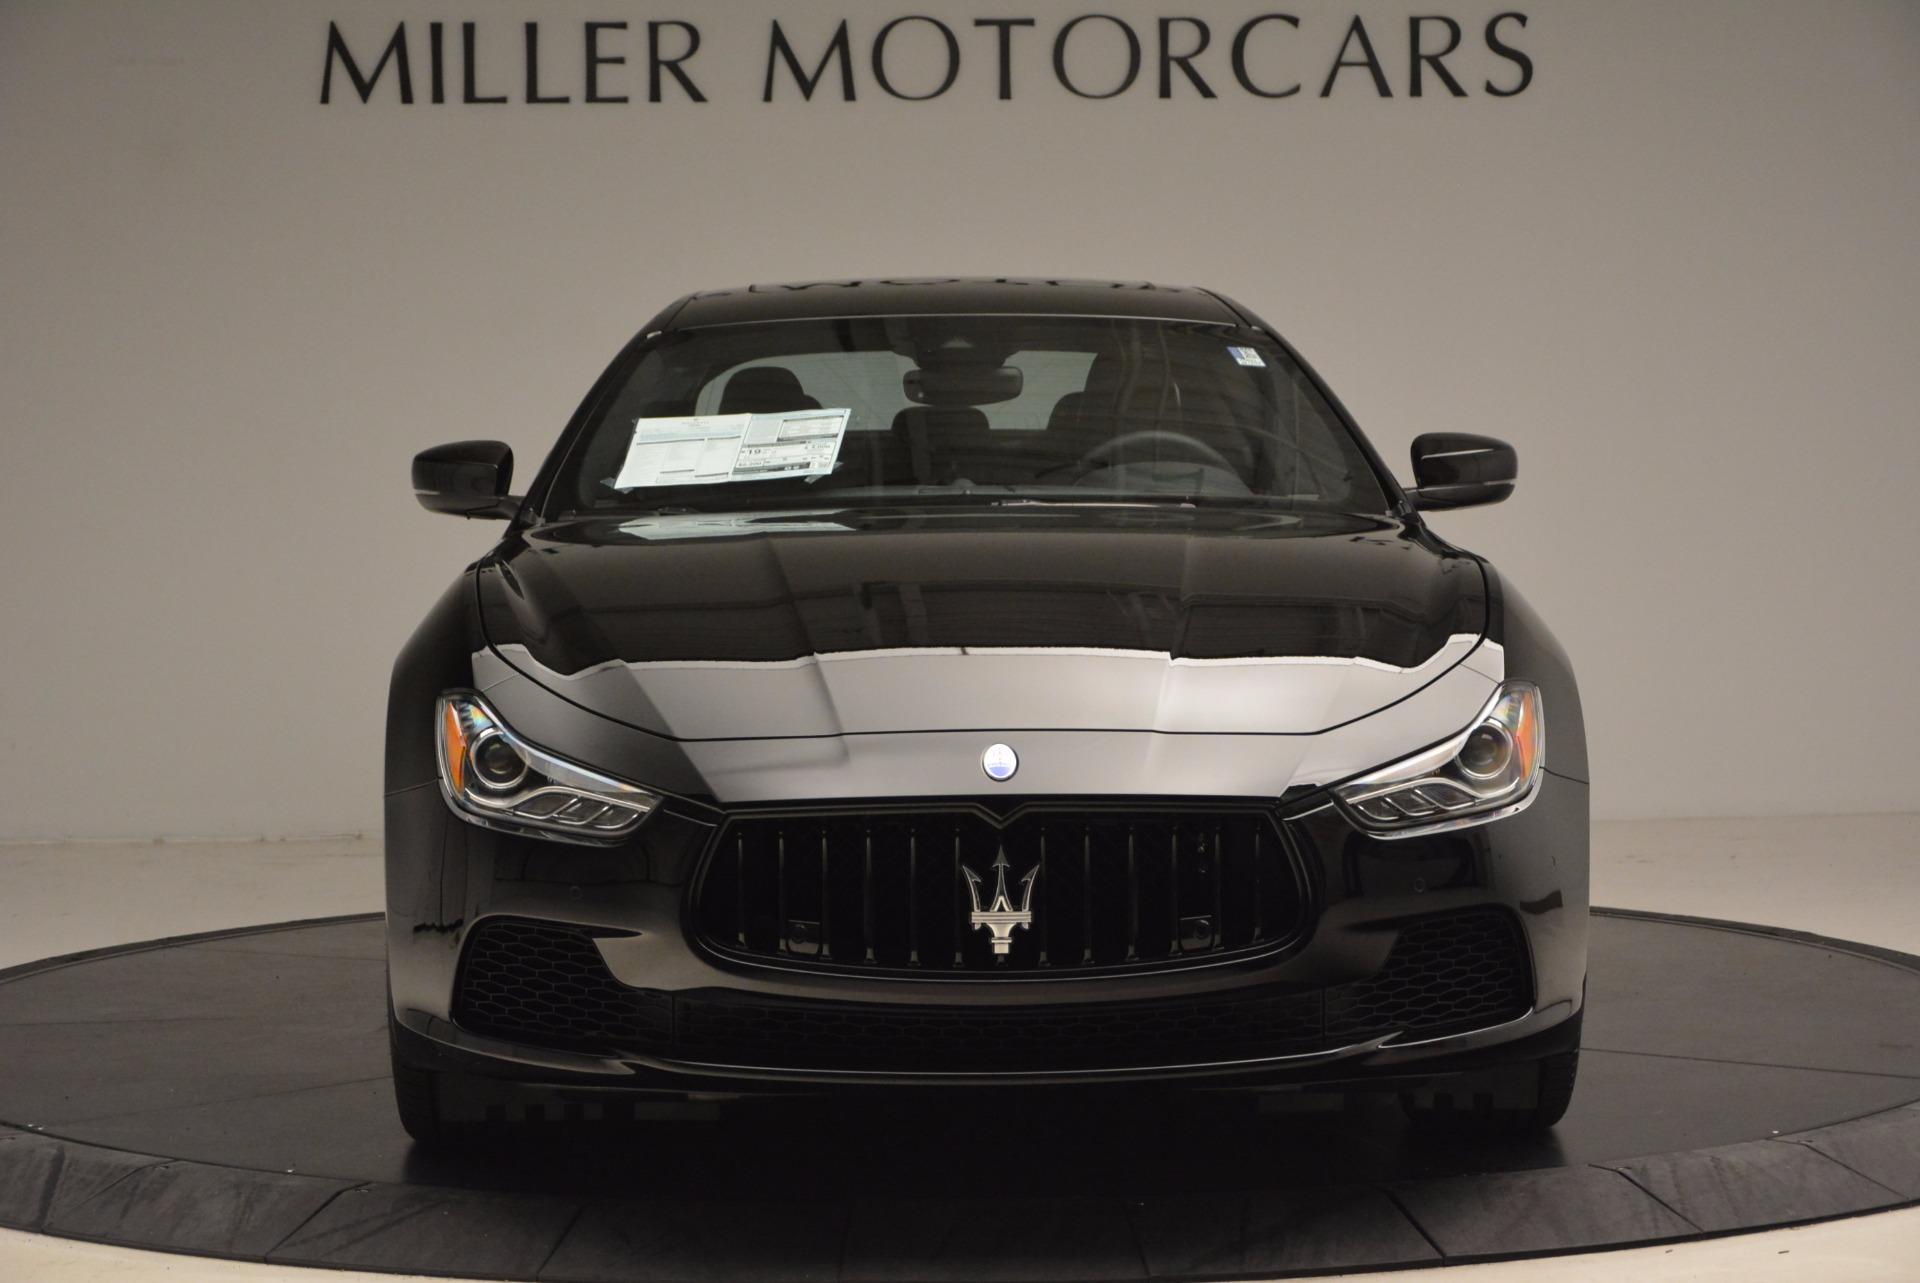 New 2017 Maserati Ghibli SQ4 S Q4 Nerissimo Edition For Sale In Westport, CT 1334_p12